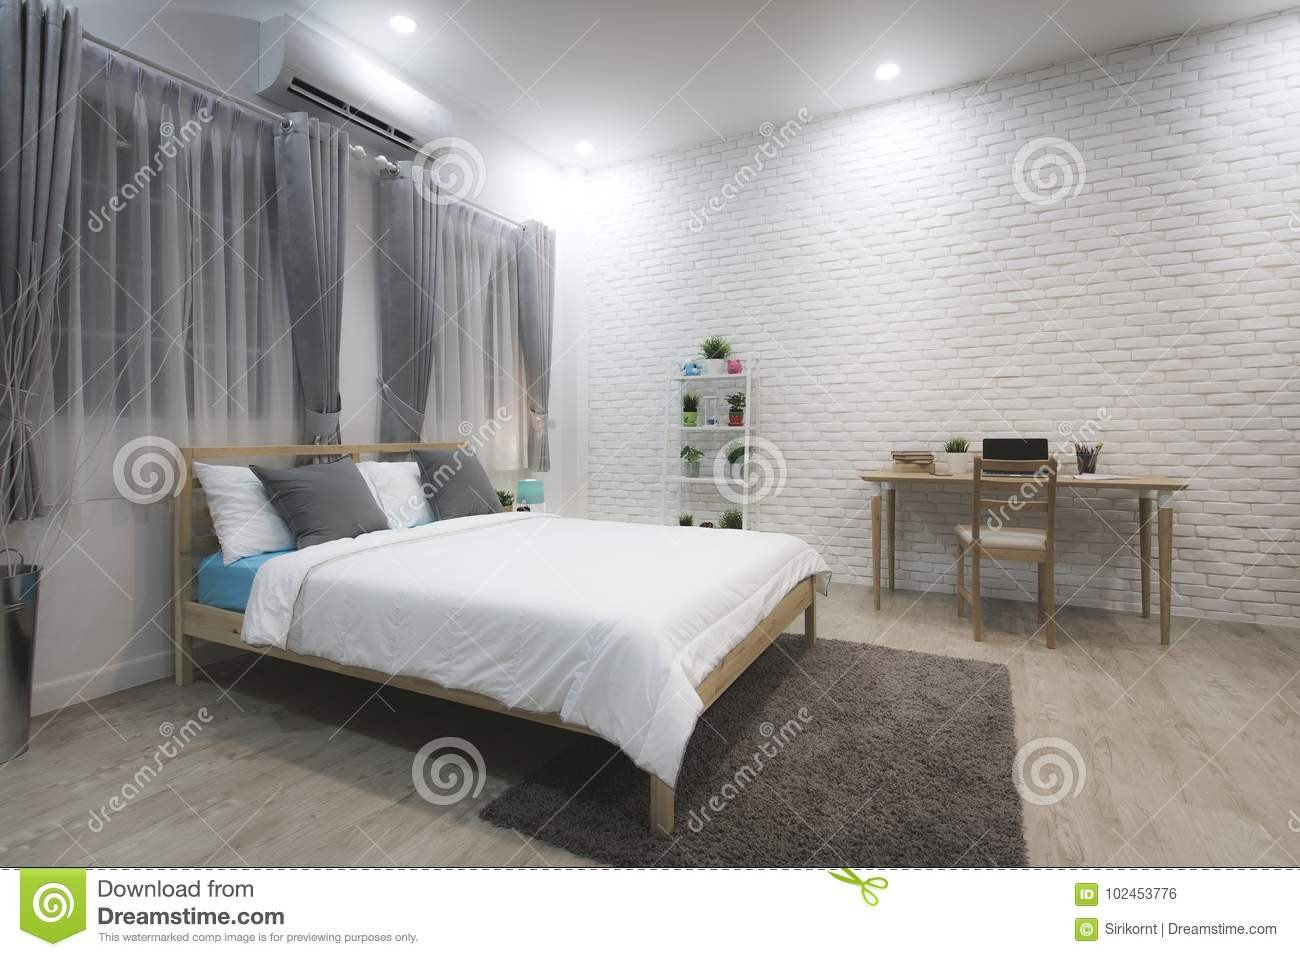 Teen Bedroom Wall Decor Fresh Stylish Designed Boy Teenager S Bedroom with White Walls